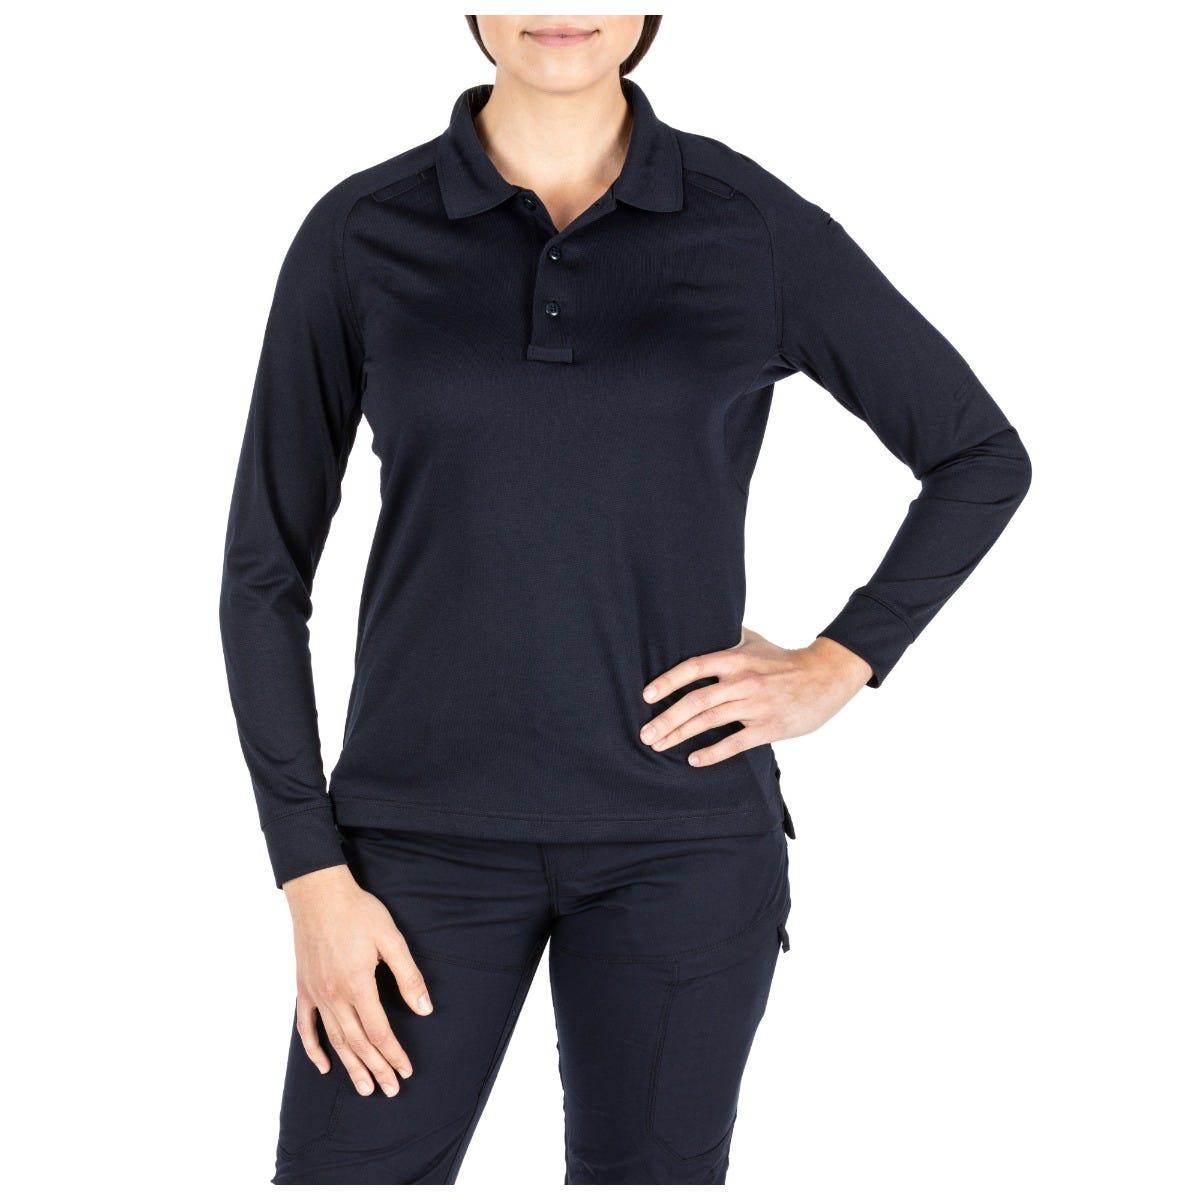 5.11 Tactical Women's Womens Performance Long Sleeve Polo Shirt